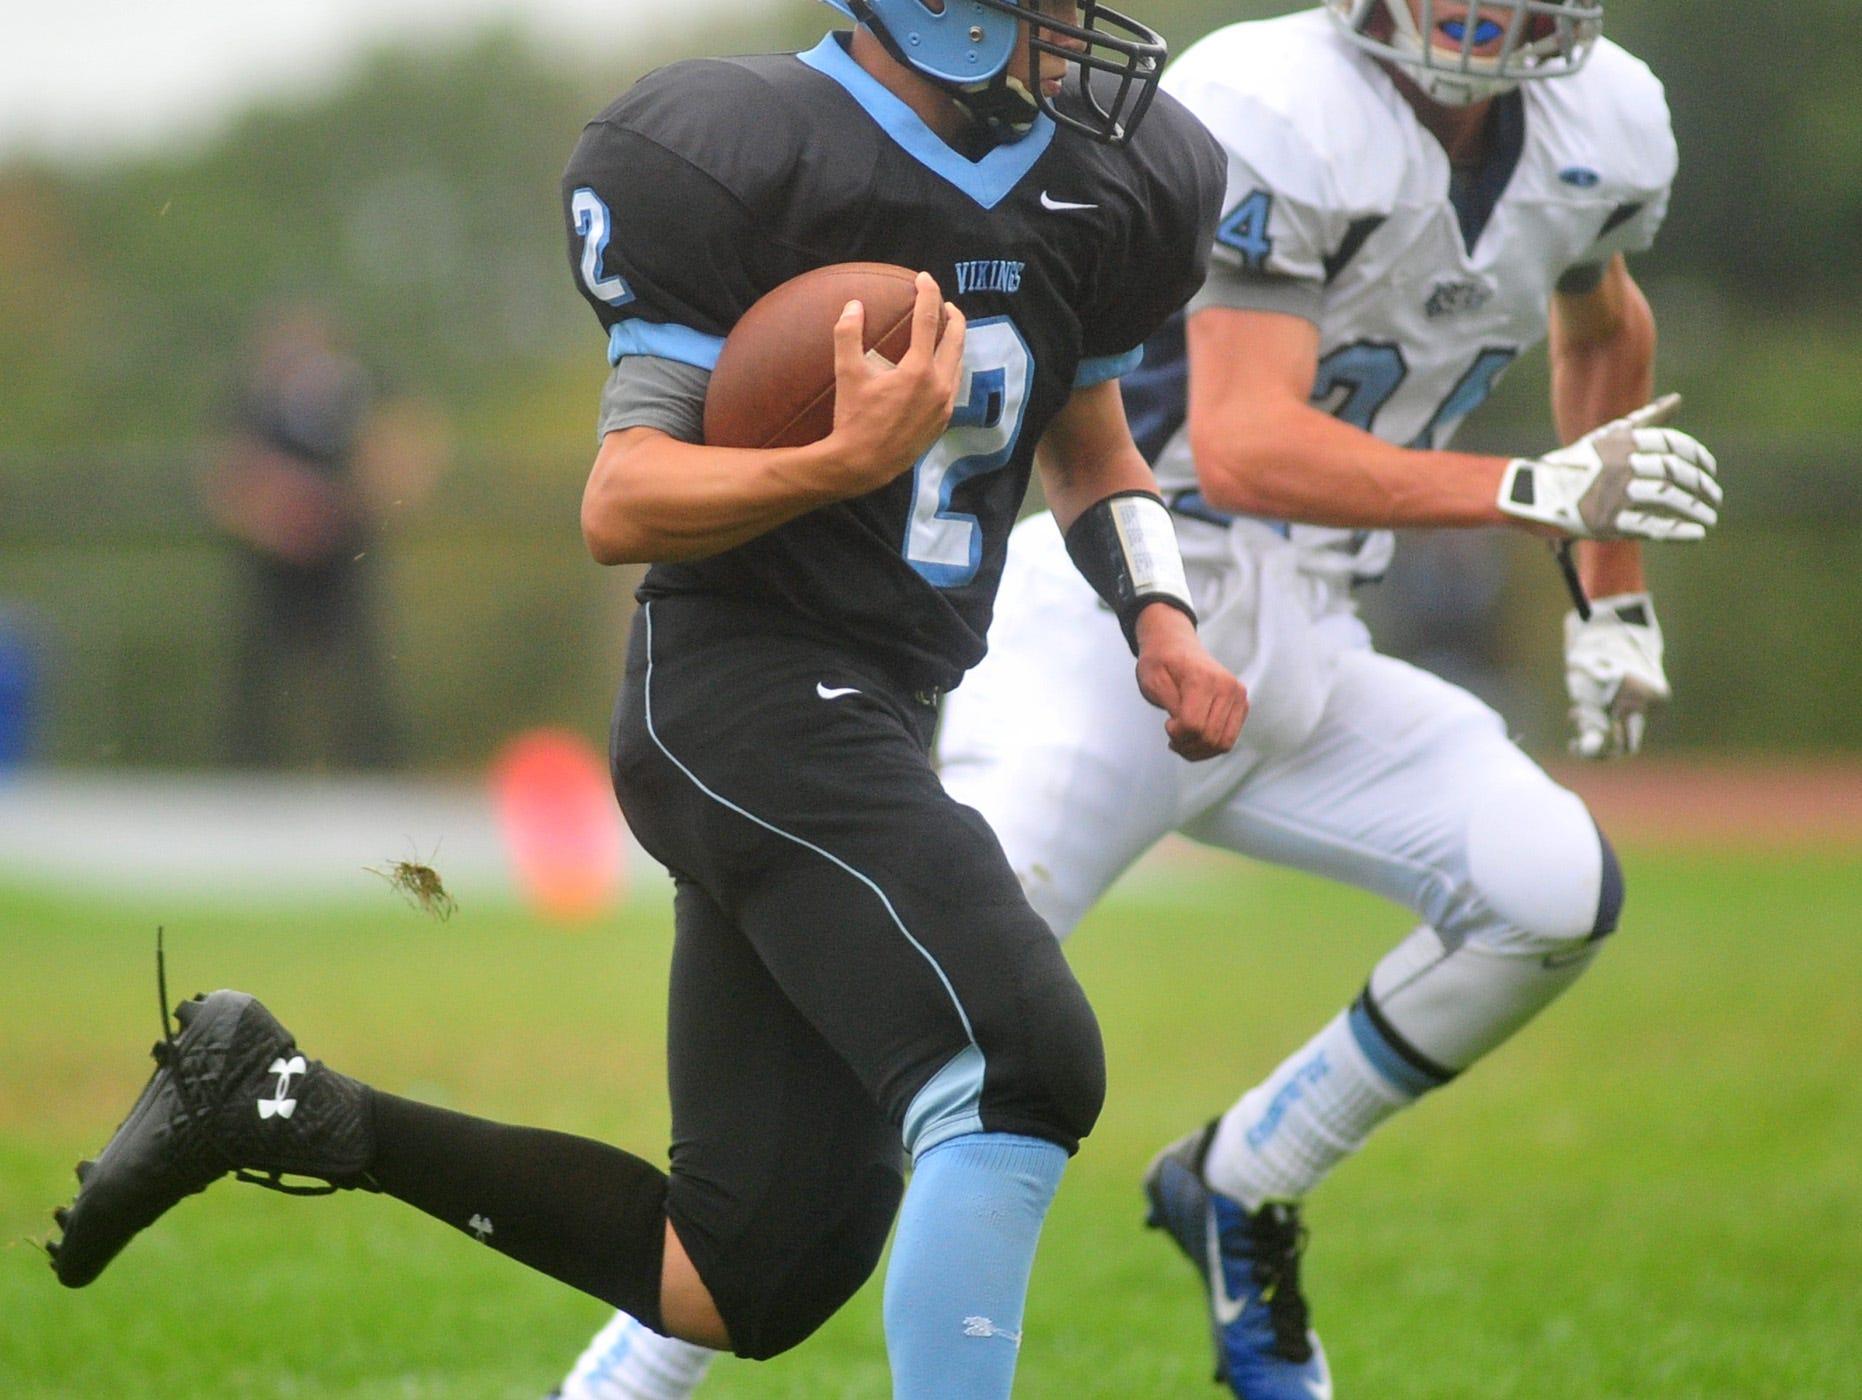 Parsippany Hills quarterback Nick Verducci carries the ball last September.